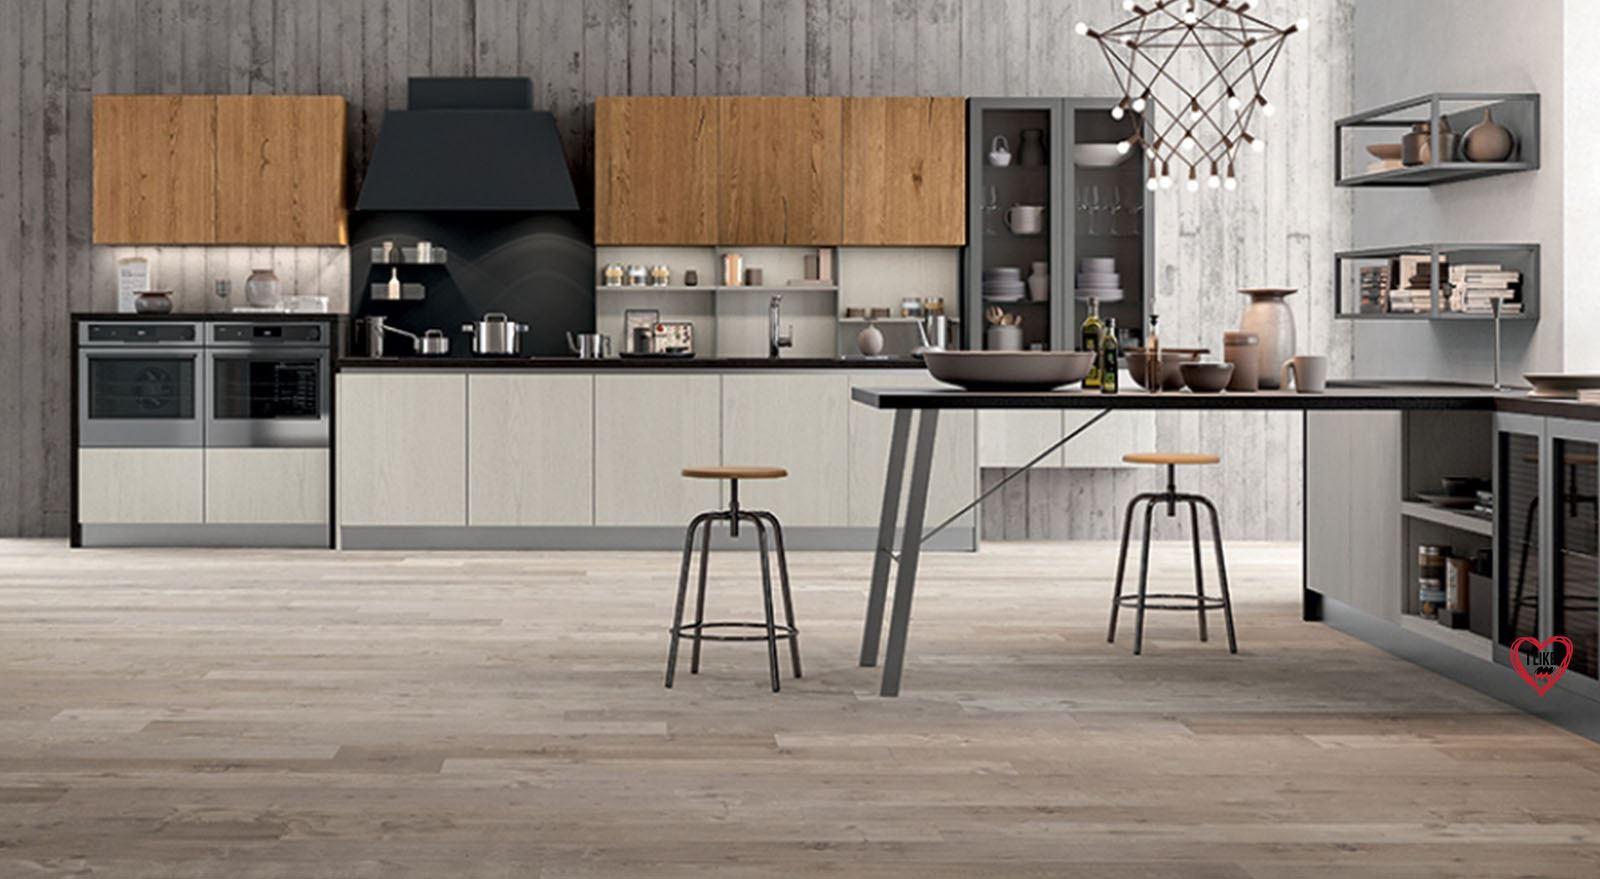 Cucine Componibili Moderne In Offerta.Le Migliori Cucine Moderne Componibili Padova